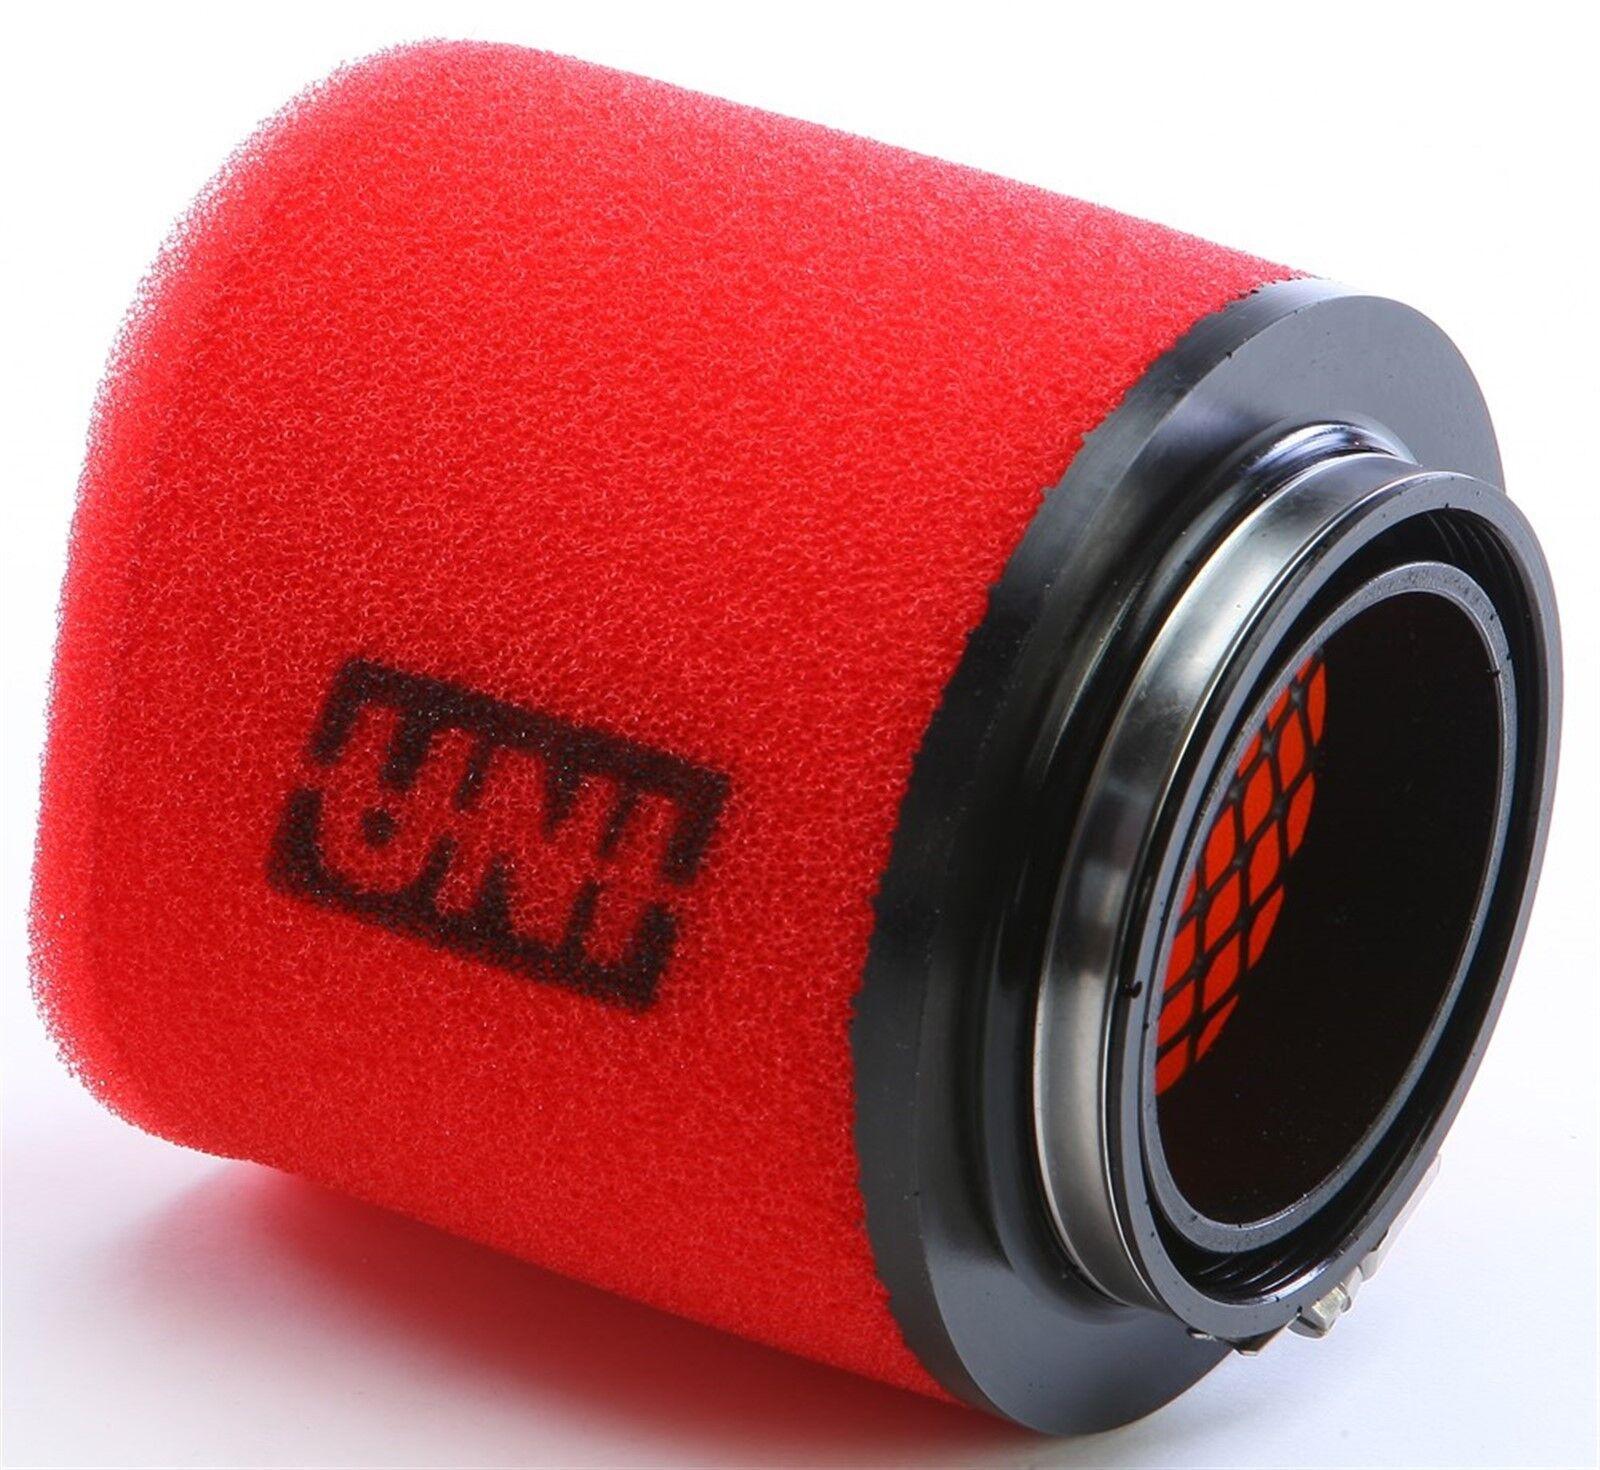 Dual Stage Air Filter Honda Big Red 700 MUV700 2009 2010 2011 2012 2013